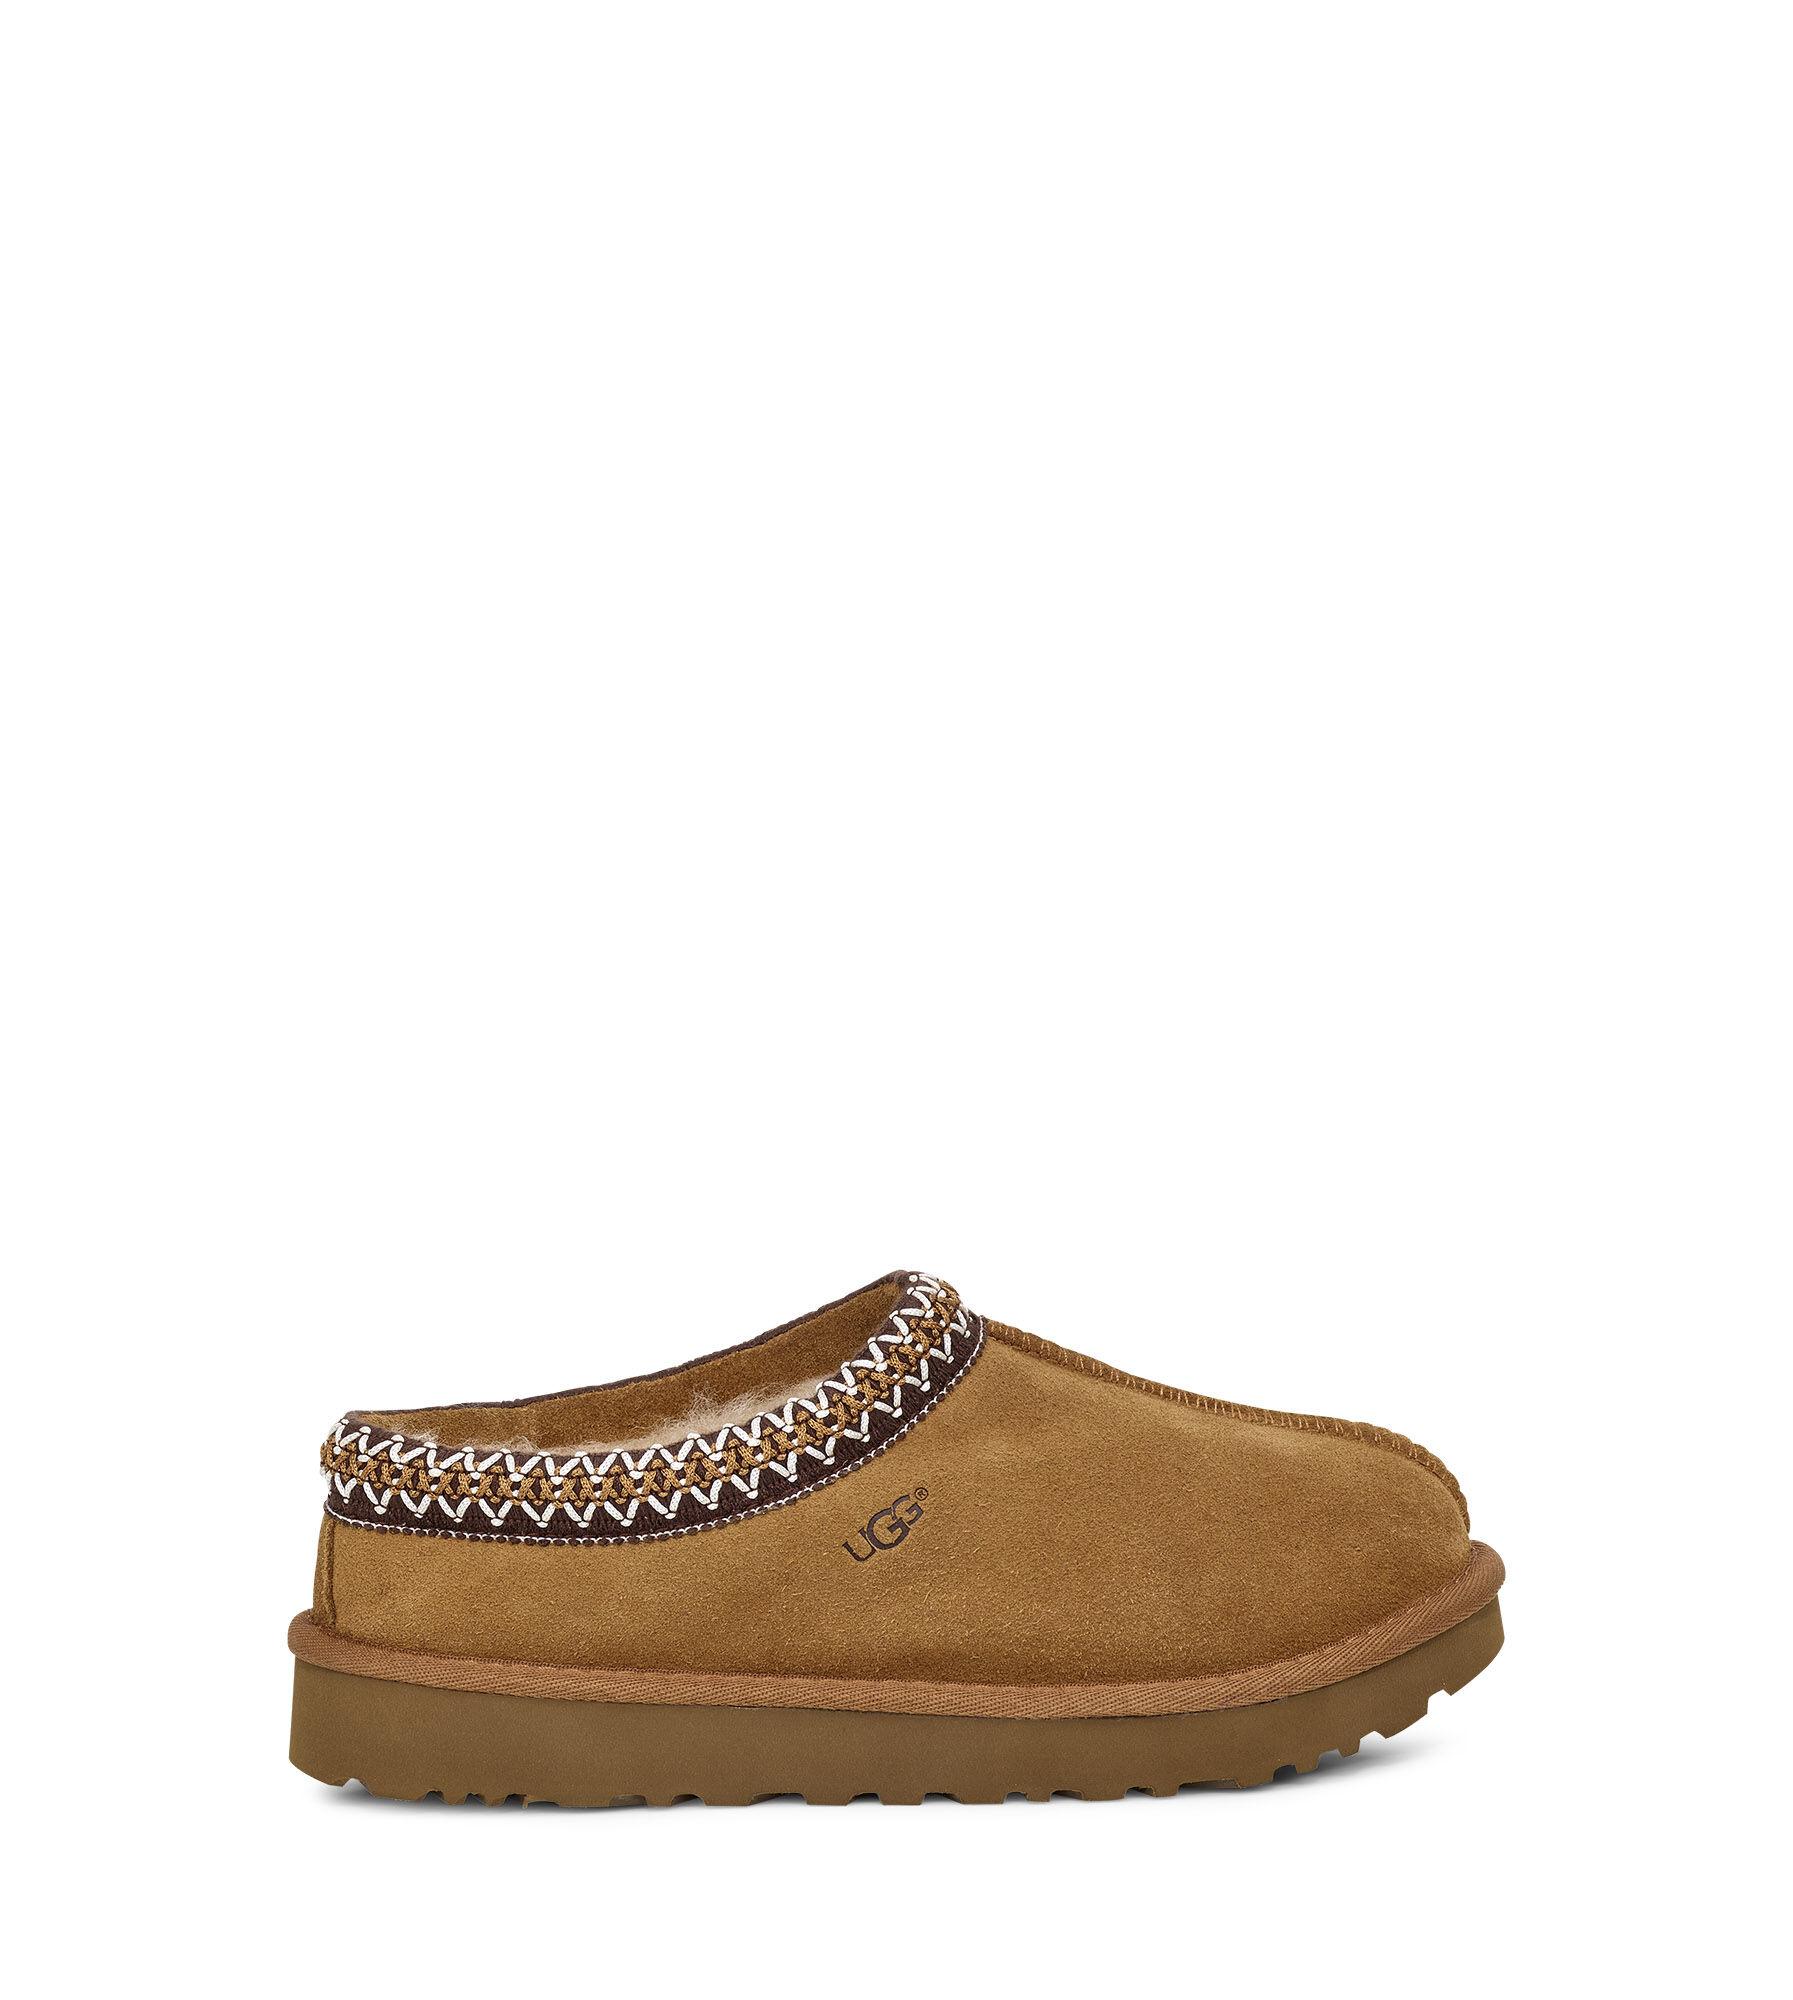 ugg slippers tasman nz